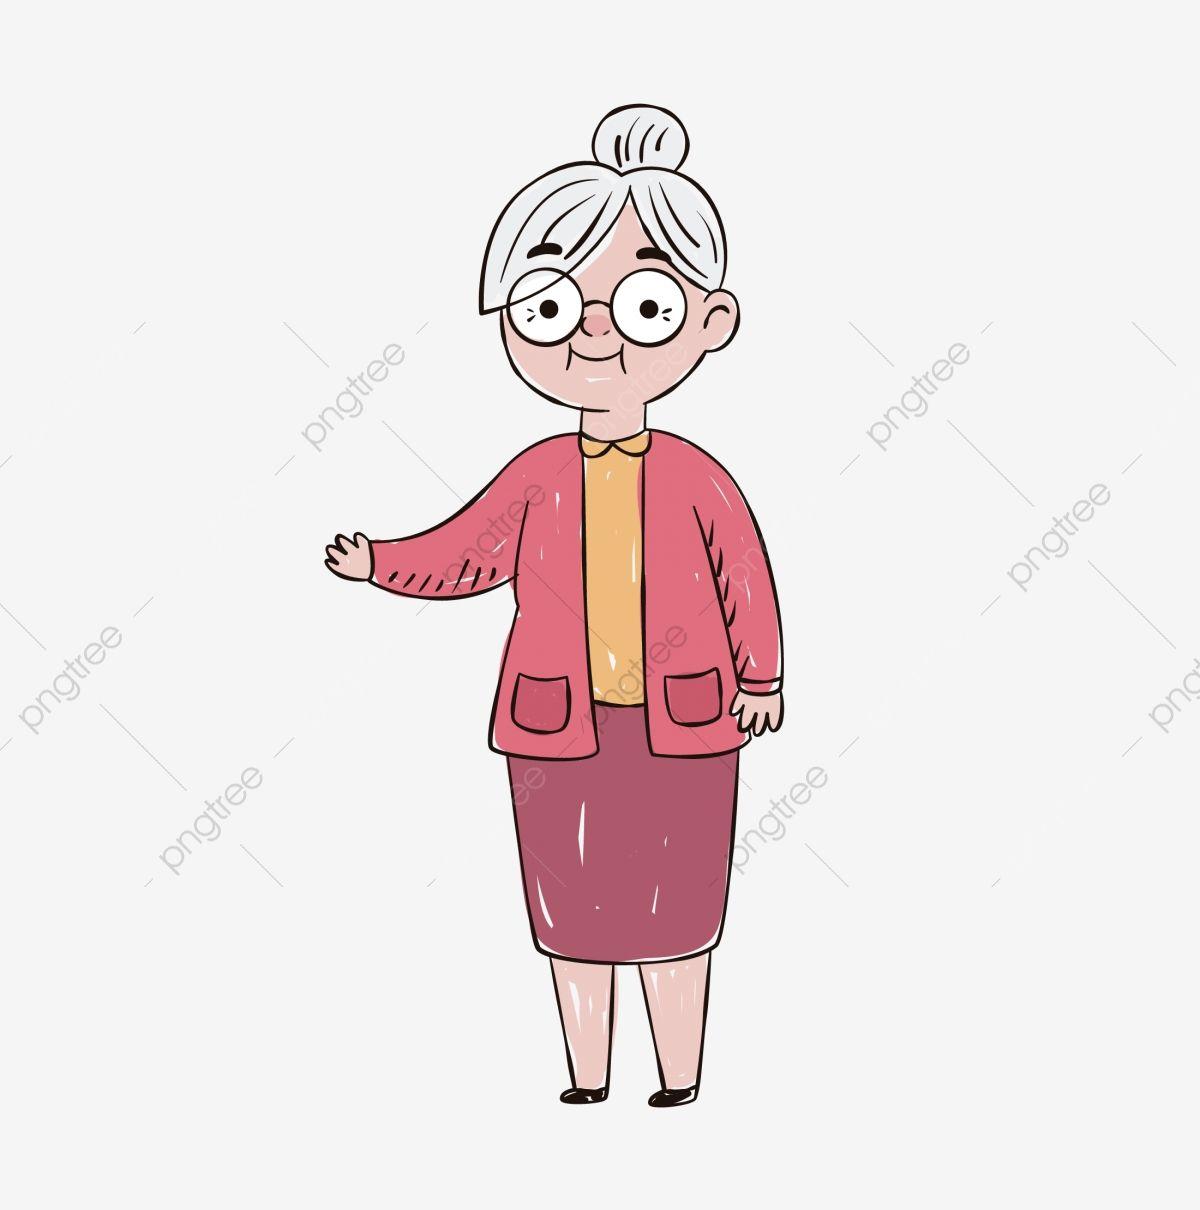 Amablemente Bondadosa Abuela Abuela Amablemente Animados Tinta Vieja Abuela Abuela De Dibujos Animados Png Y Vector Para Descargar Gratis Pngtree How To Draw Hands Hand Painted Graphic Resources